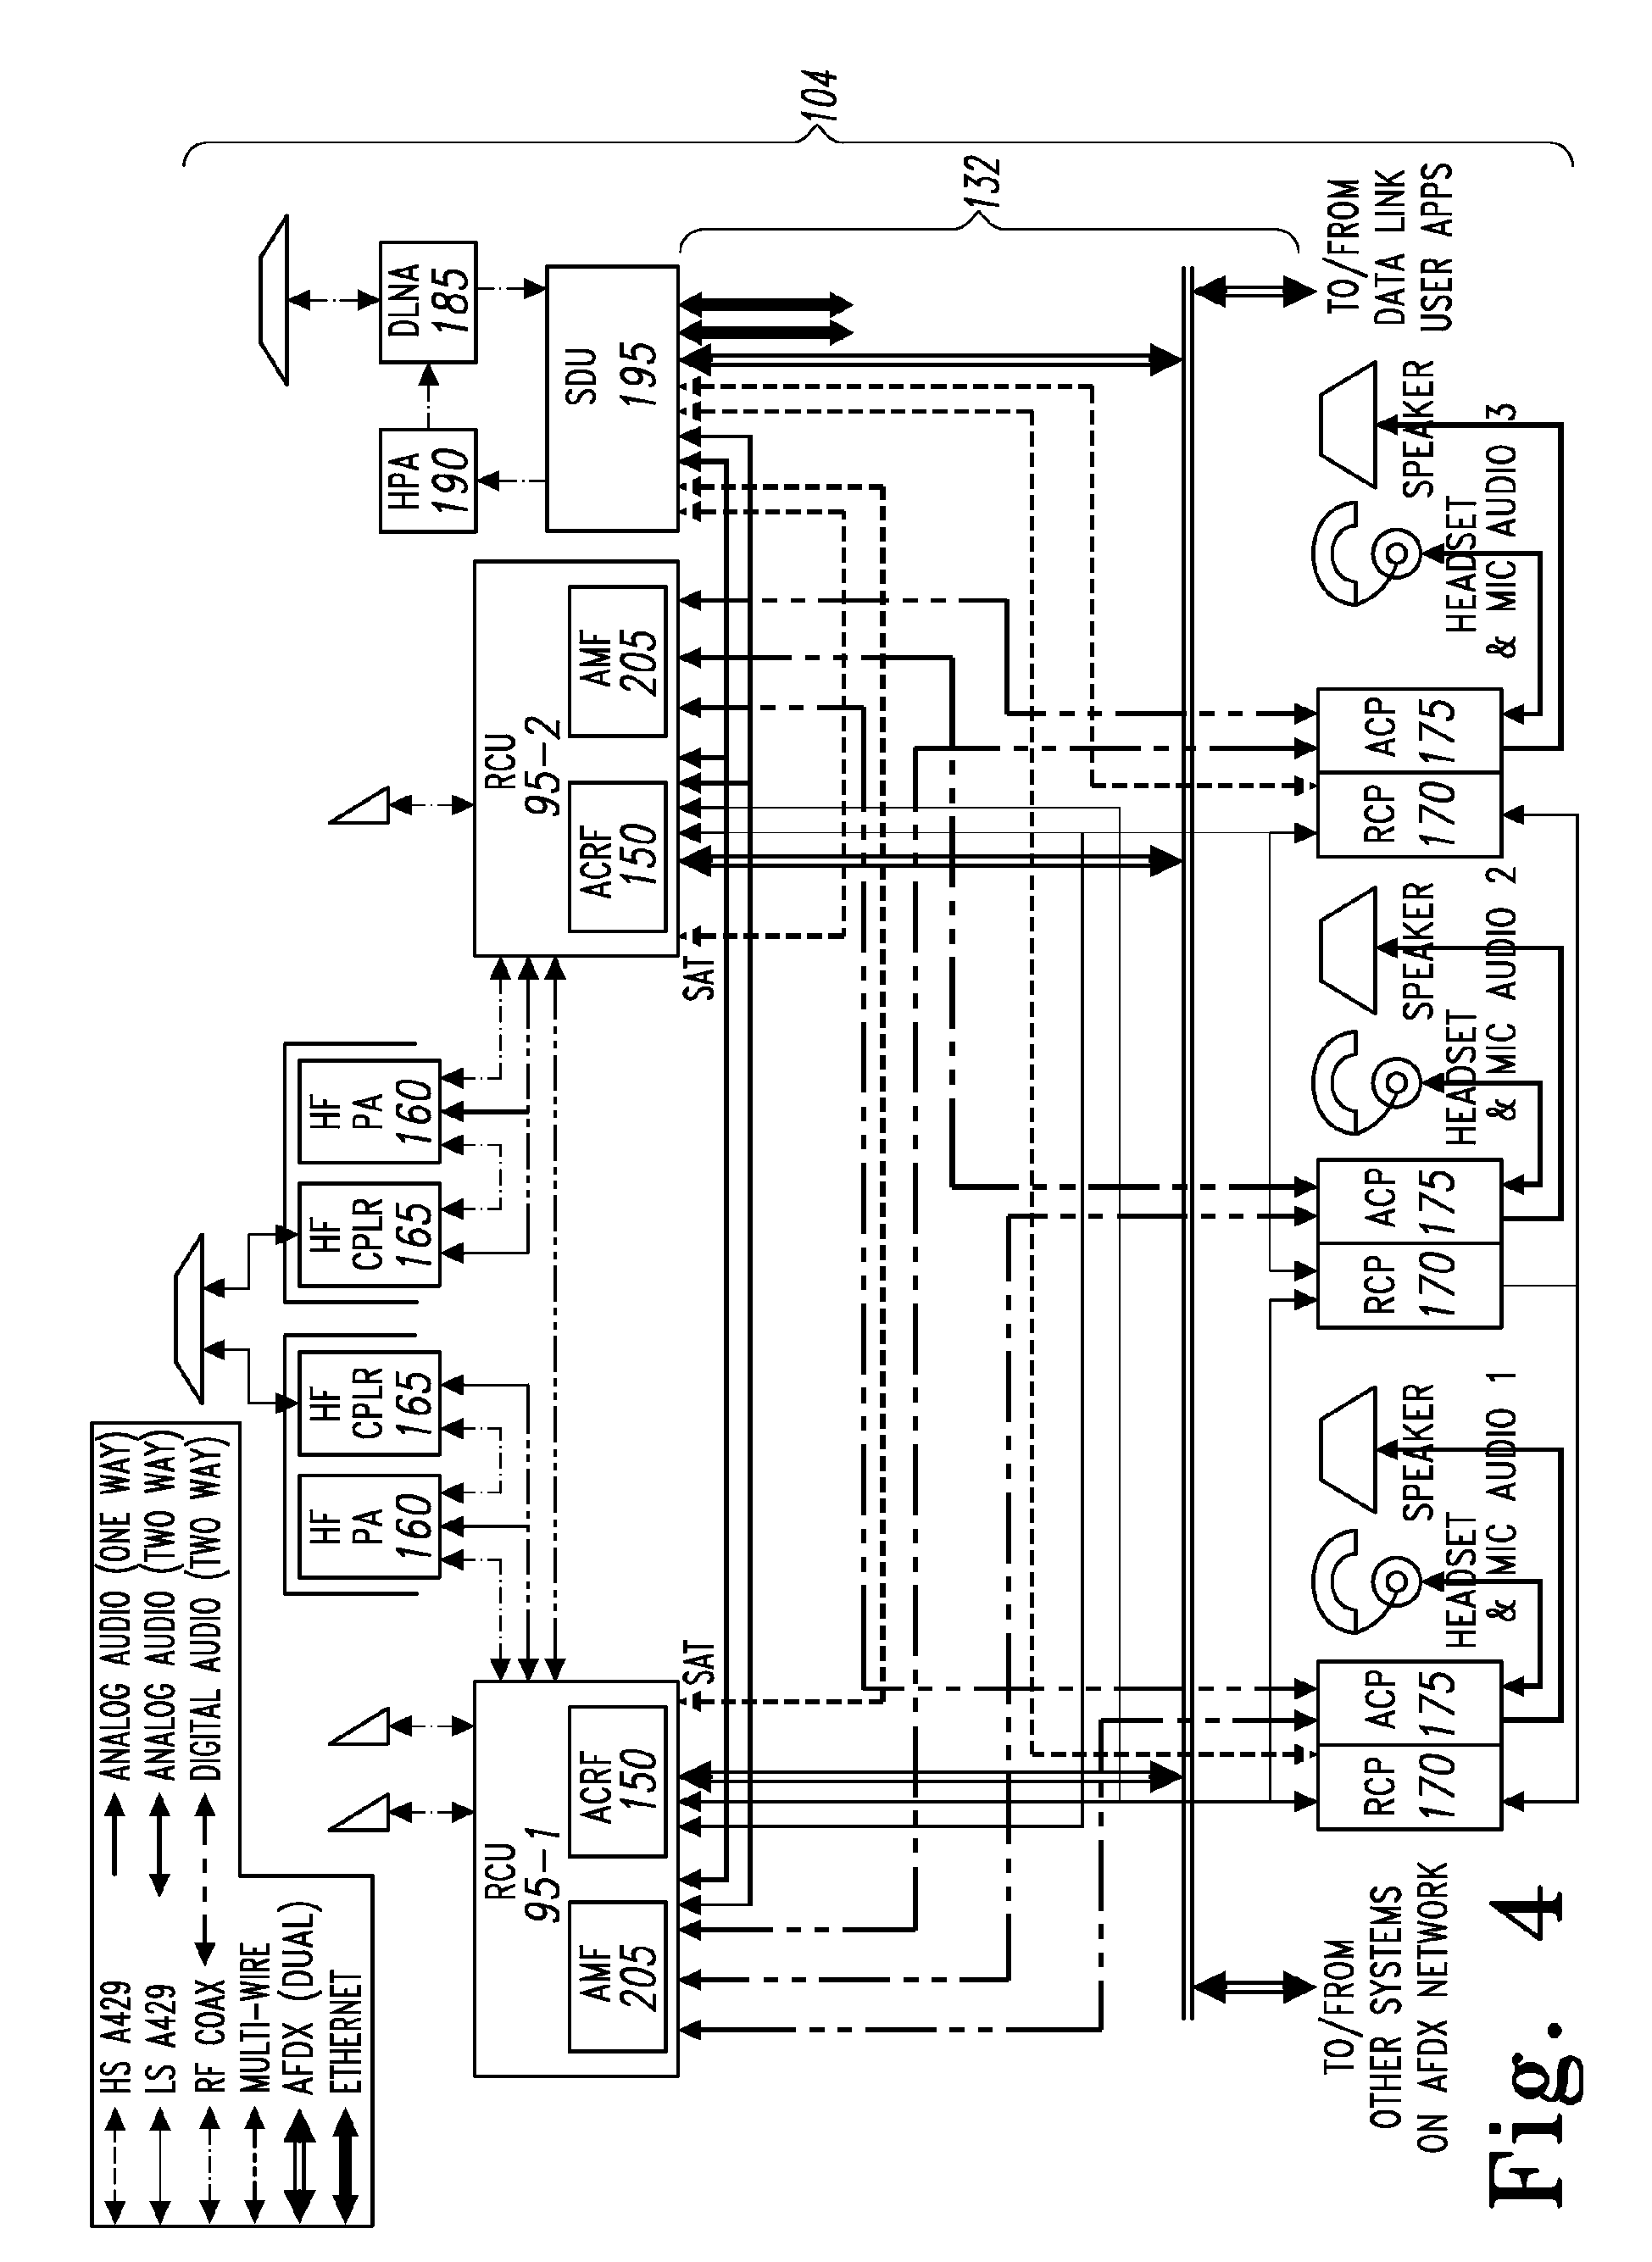 Delco Diagram Wiring Ac Alternator